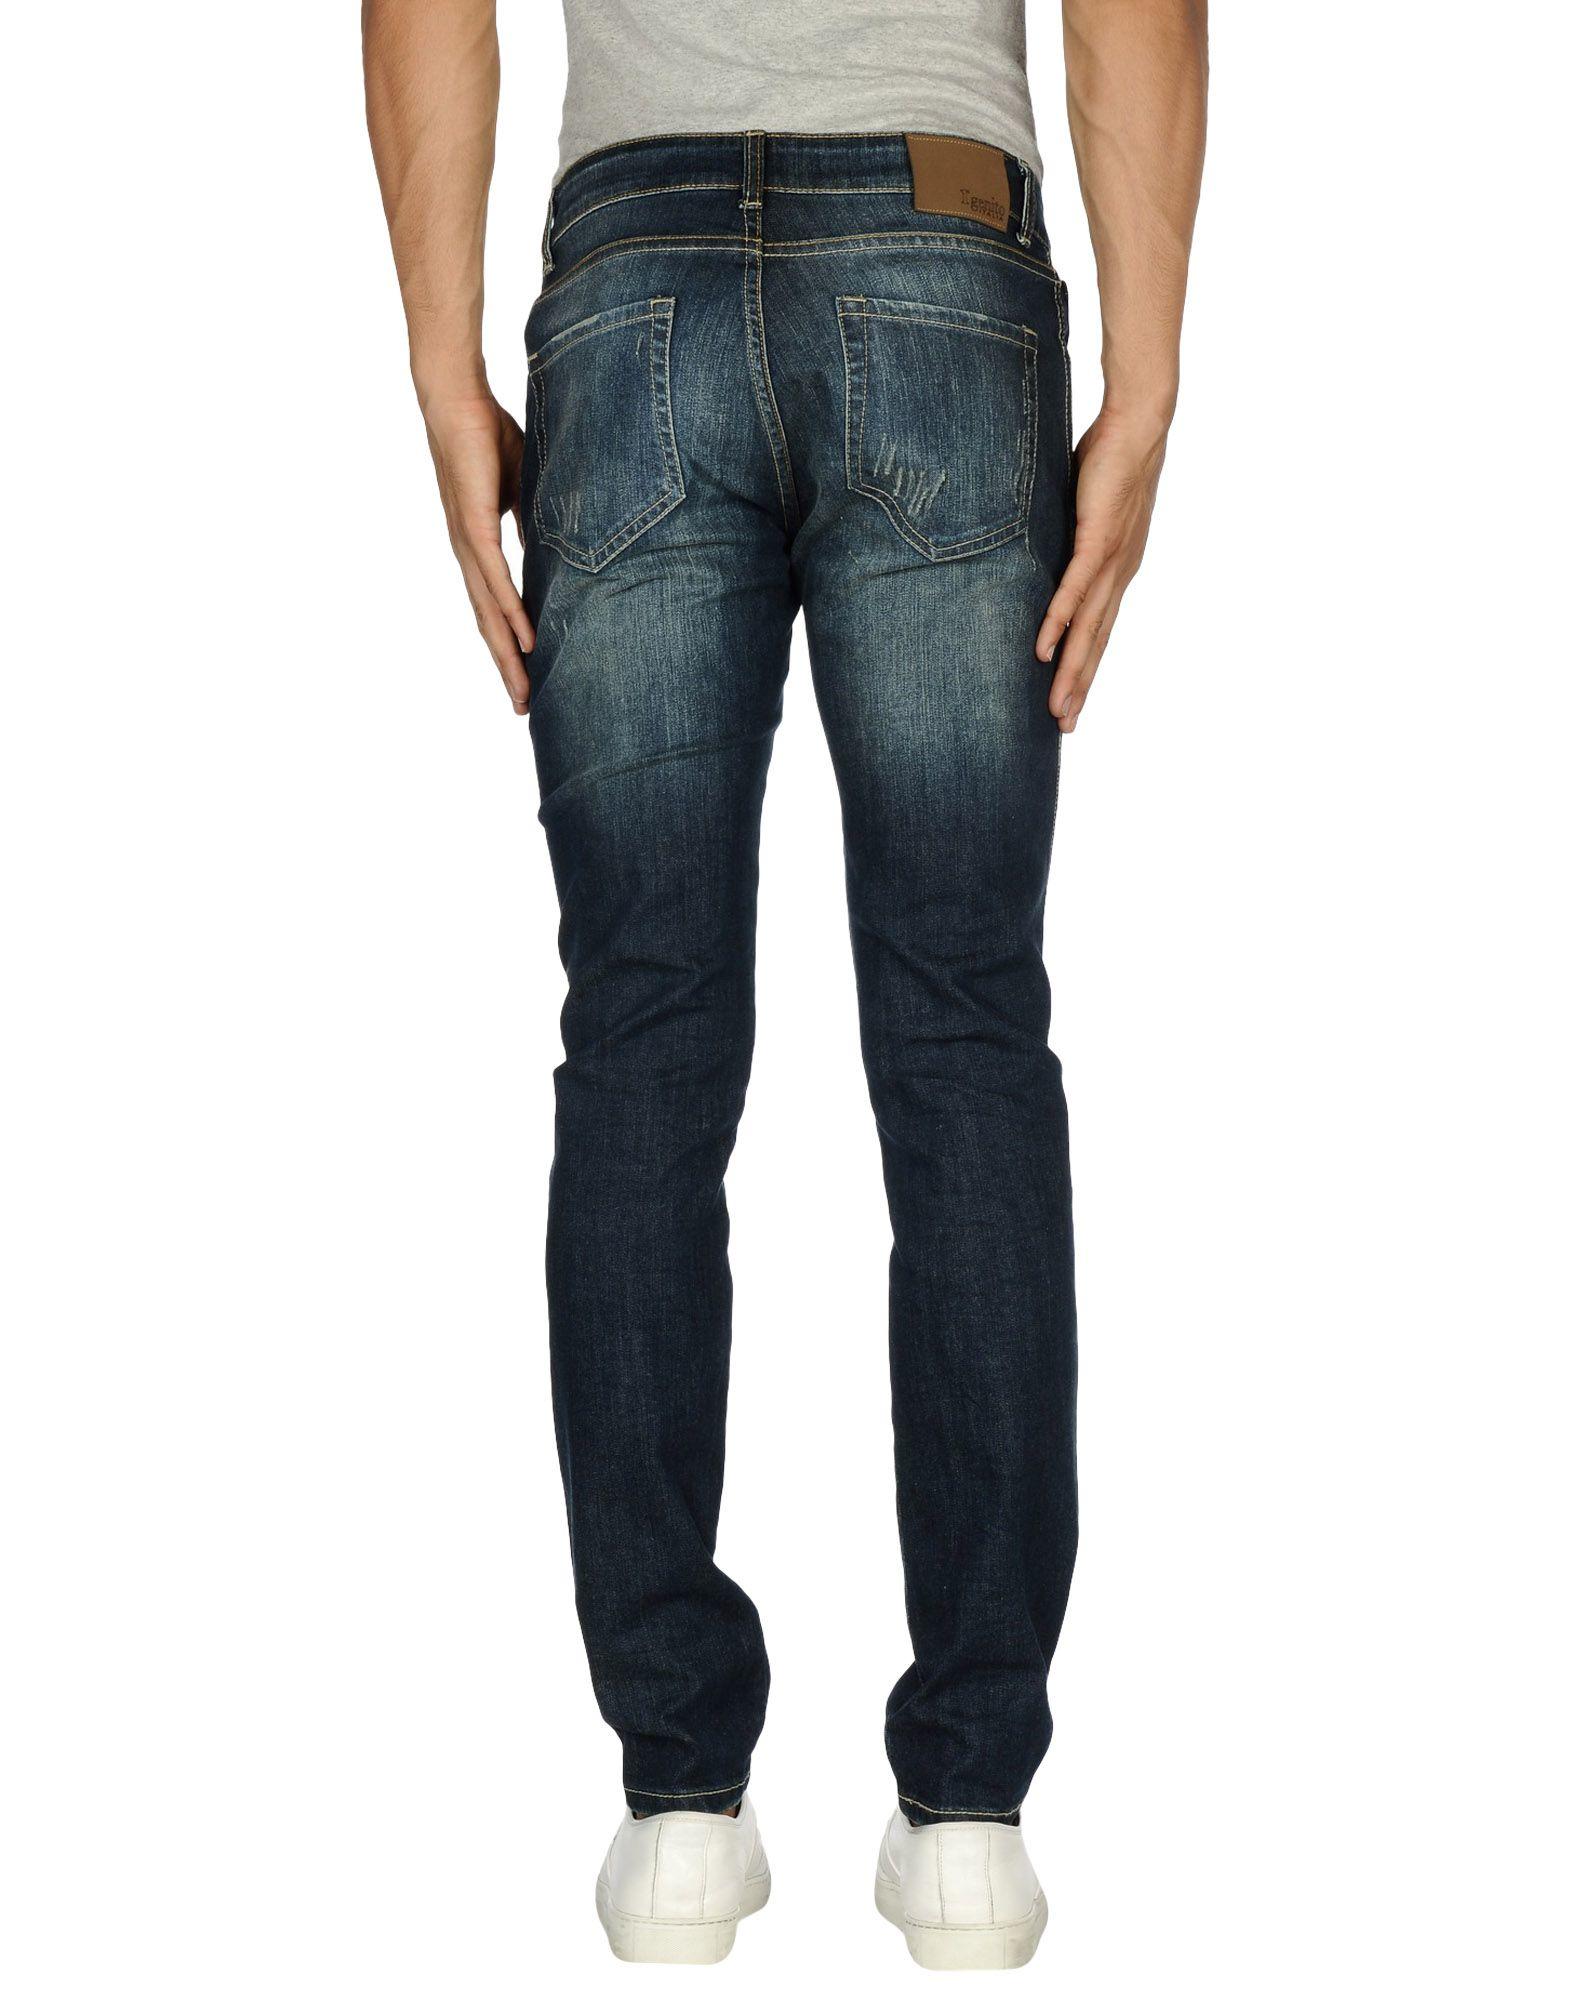 DENIM - Denim trousers 1 MKw9fzx